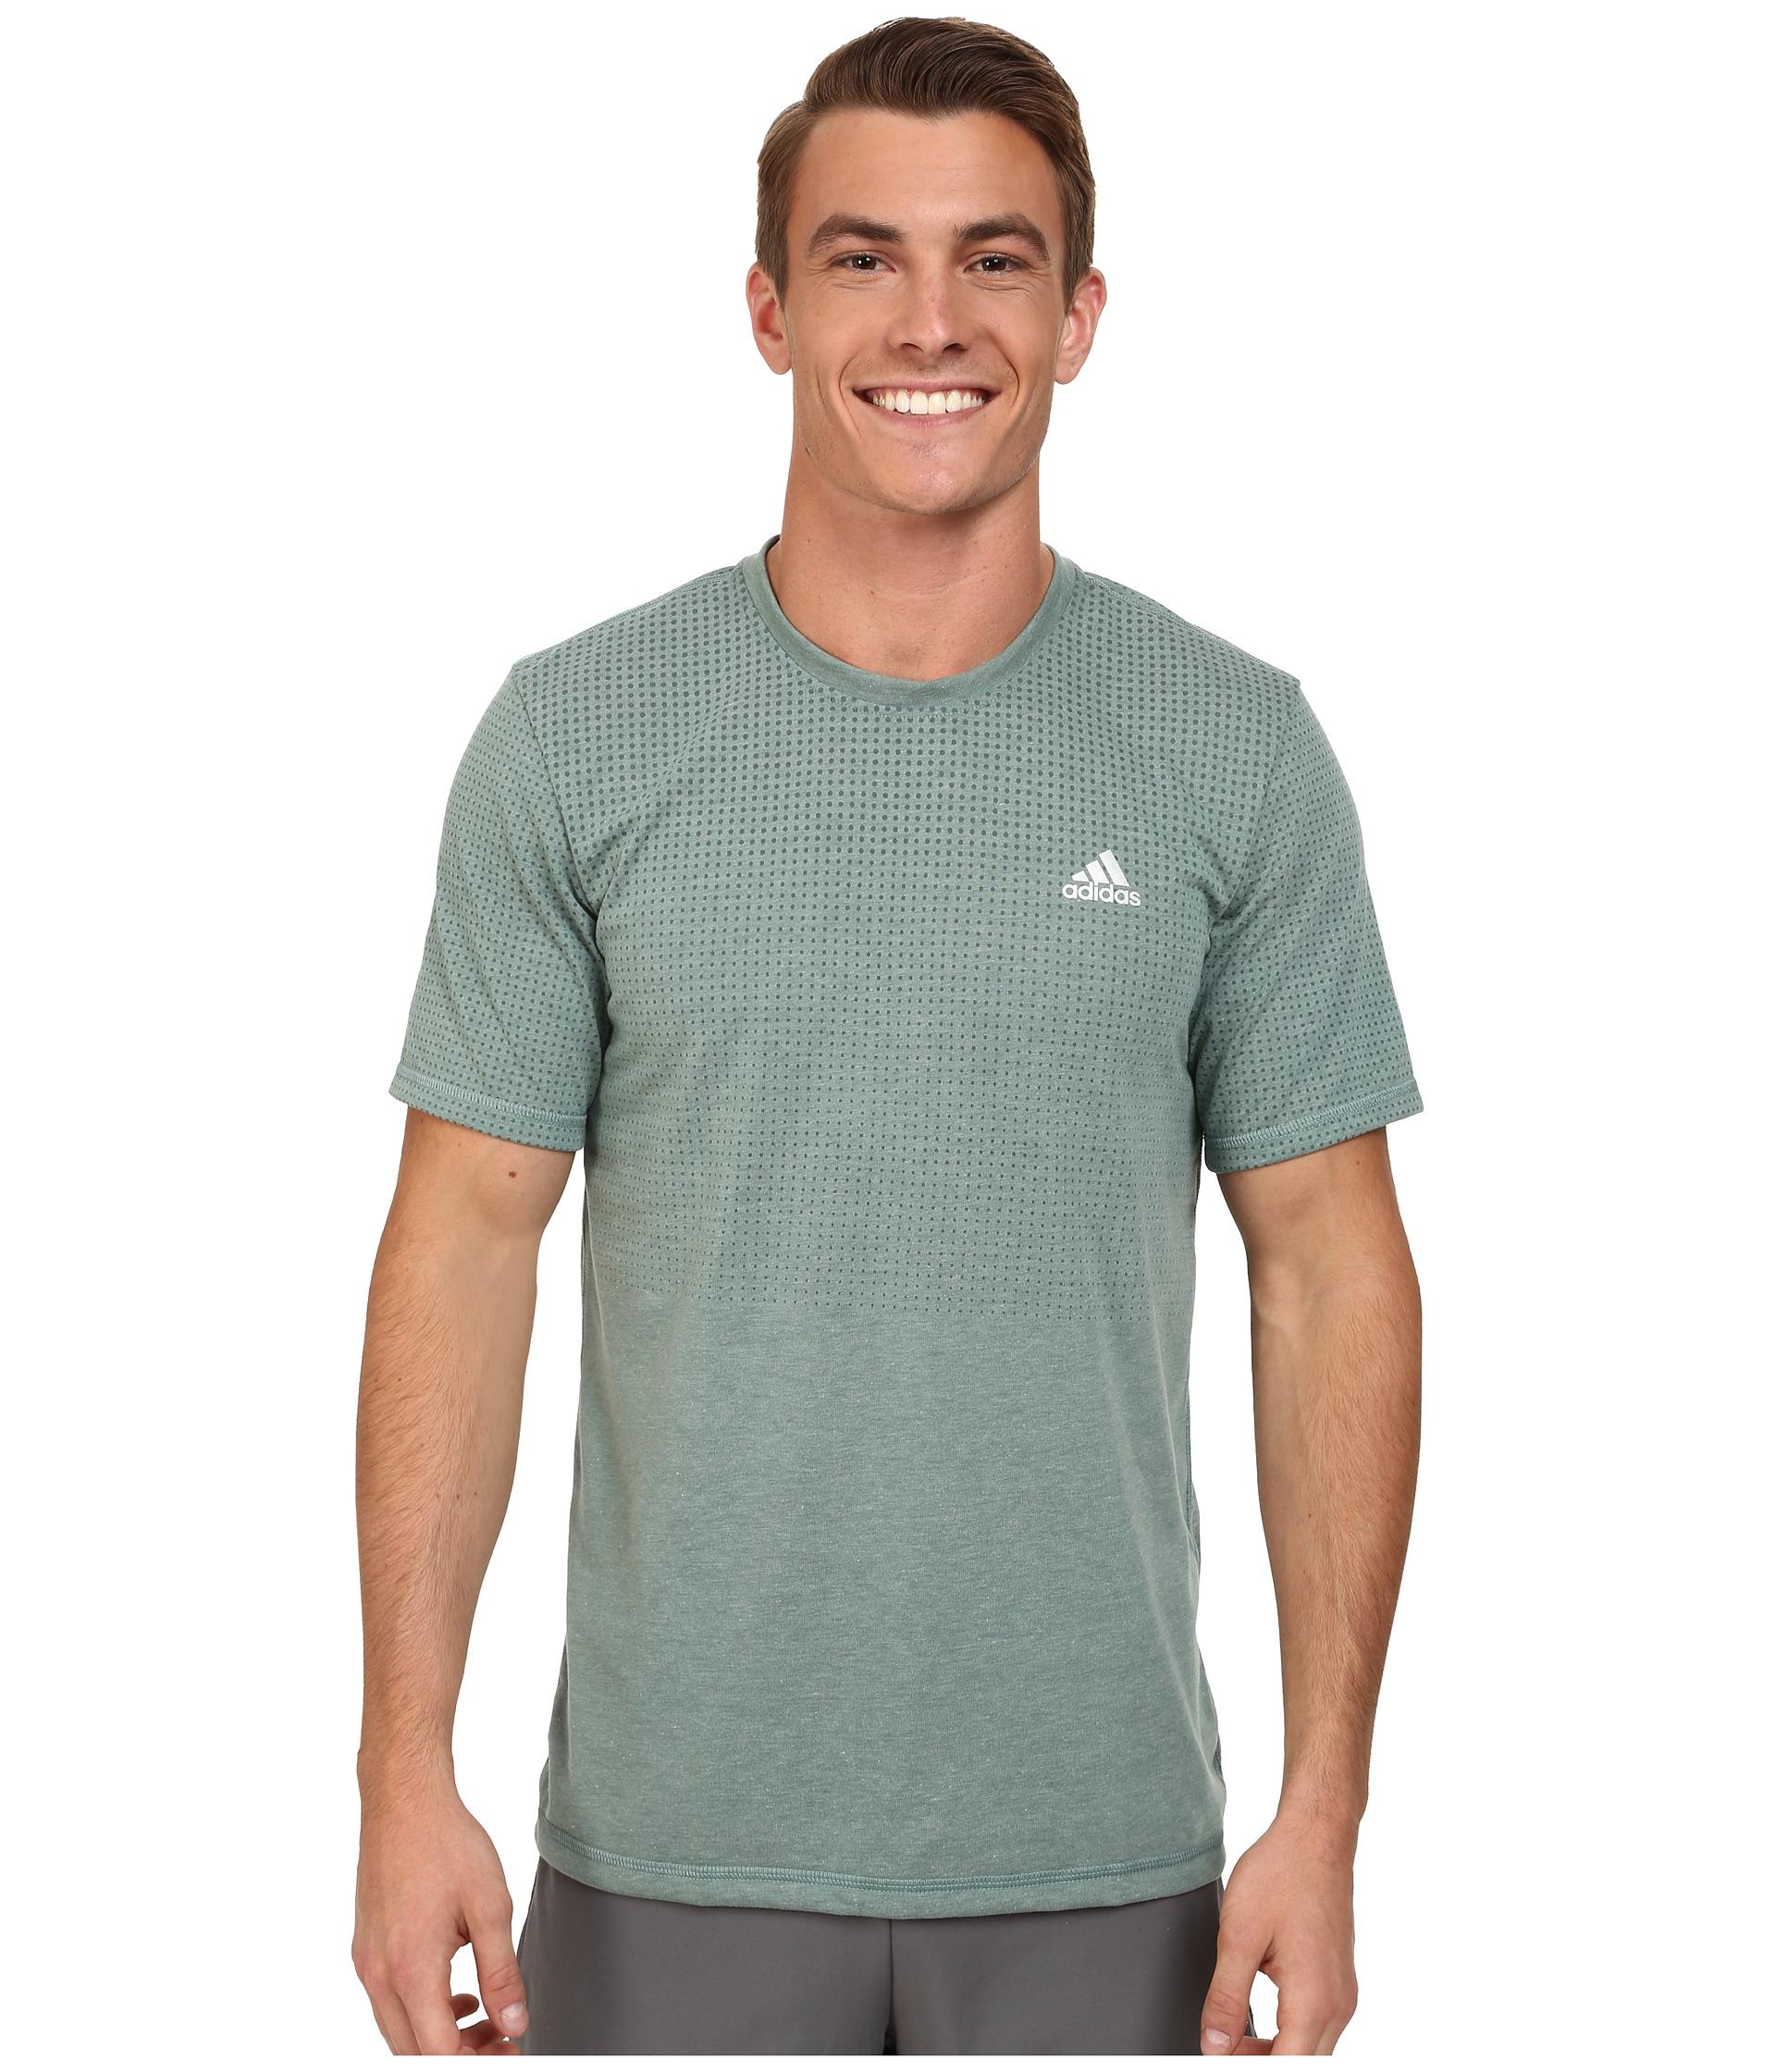 Camiseta corta Lyst verde Adidas 19627 Aeroknit de manga corta en verde para hombre 998e4a9 - hvorvikankobe.website